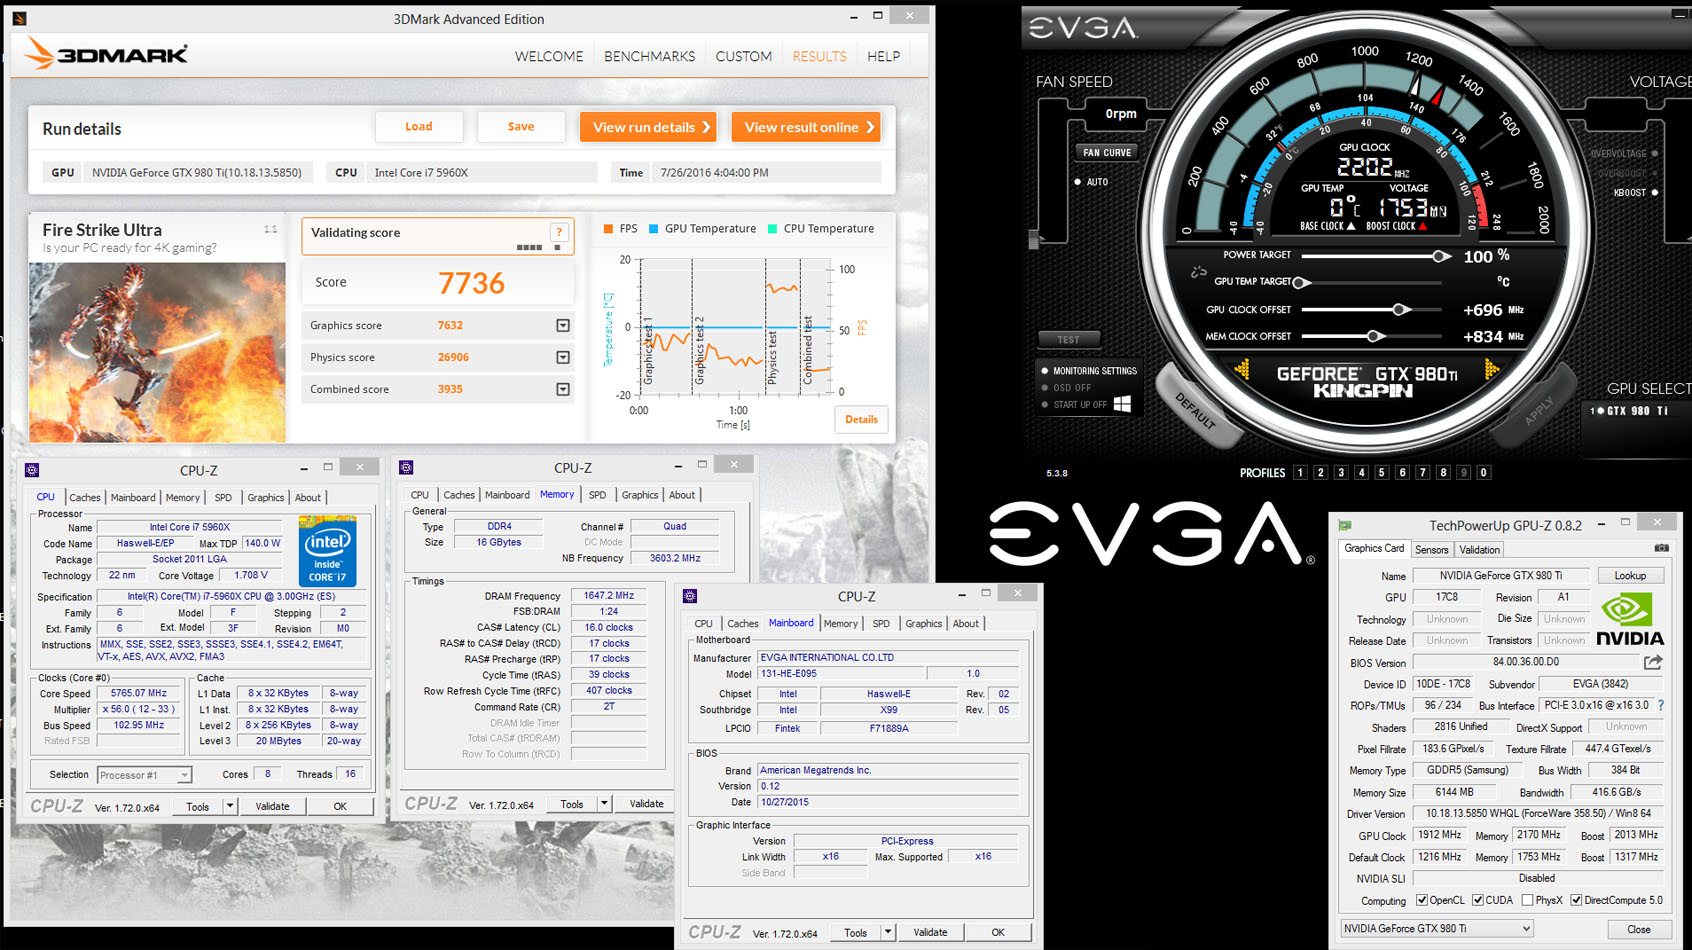 EVGA GeForce GTX 980 Ti Kingpin smashes benchmark records